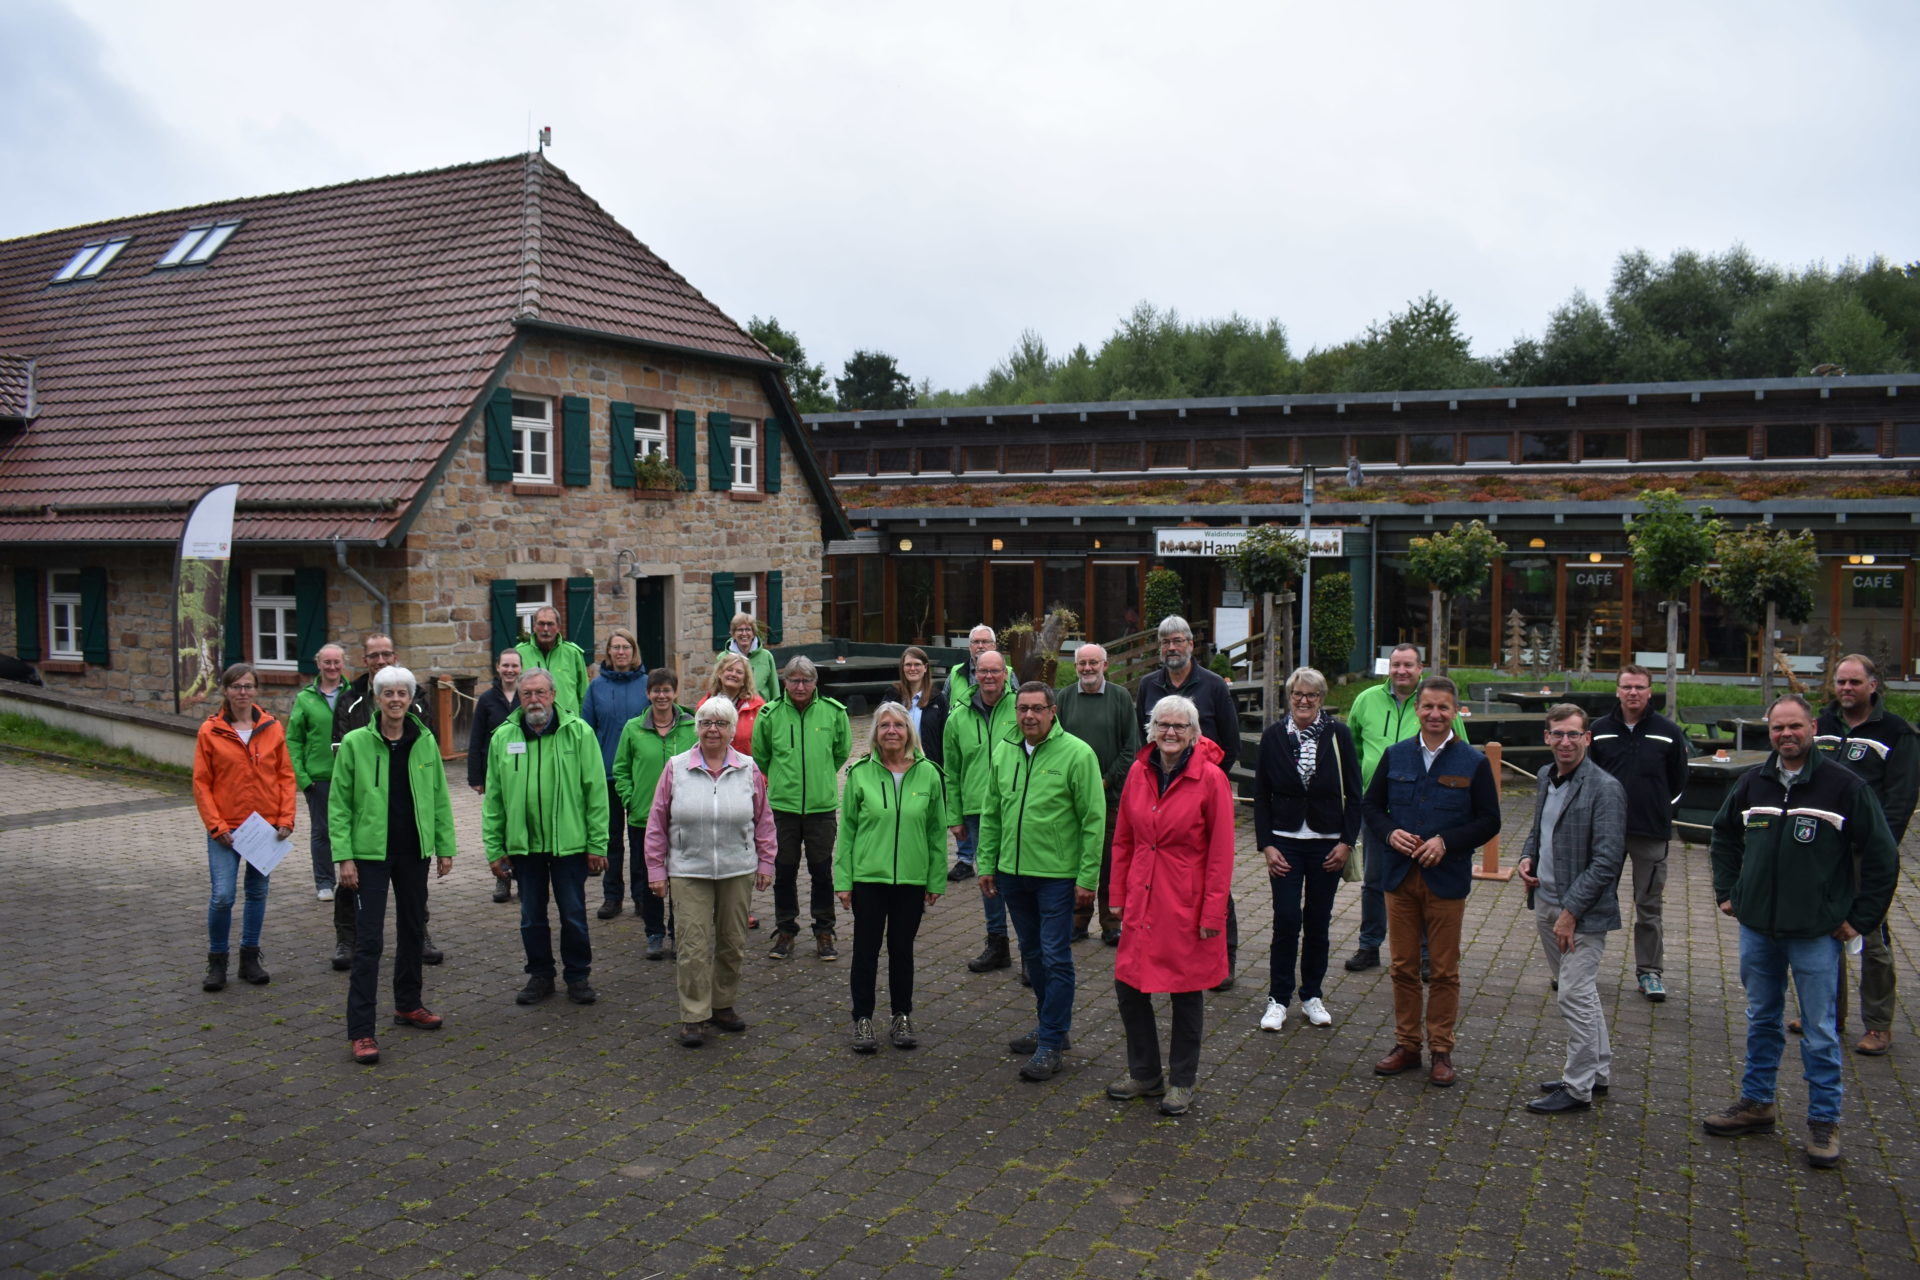 Gruppenfoto der neu zertifizierten Naturparkführer